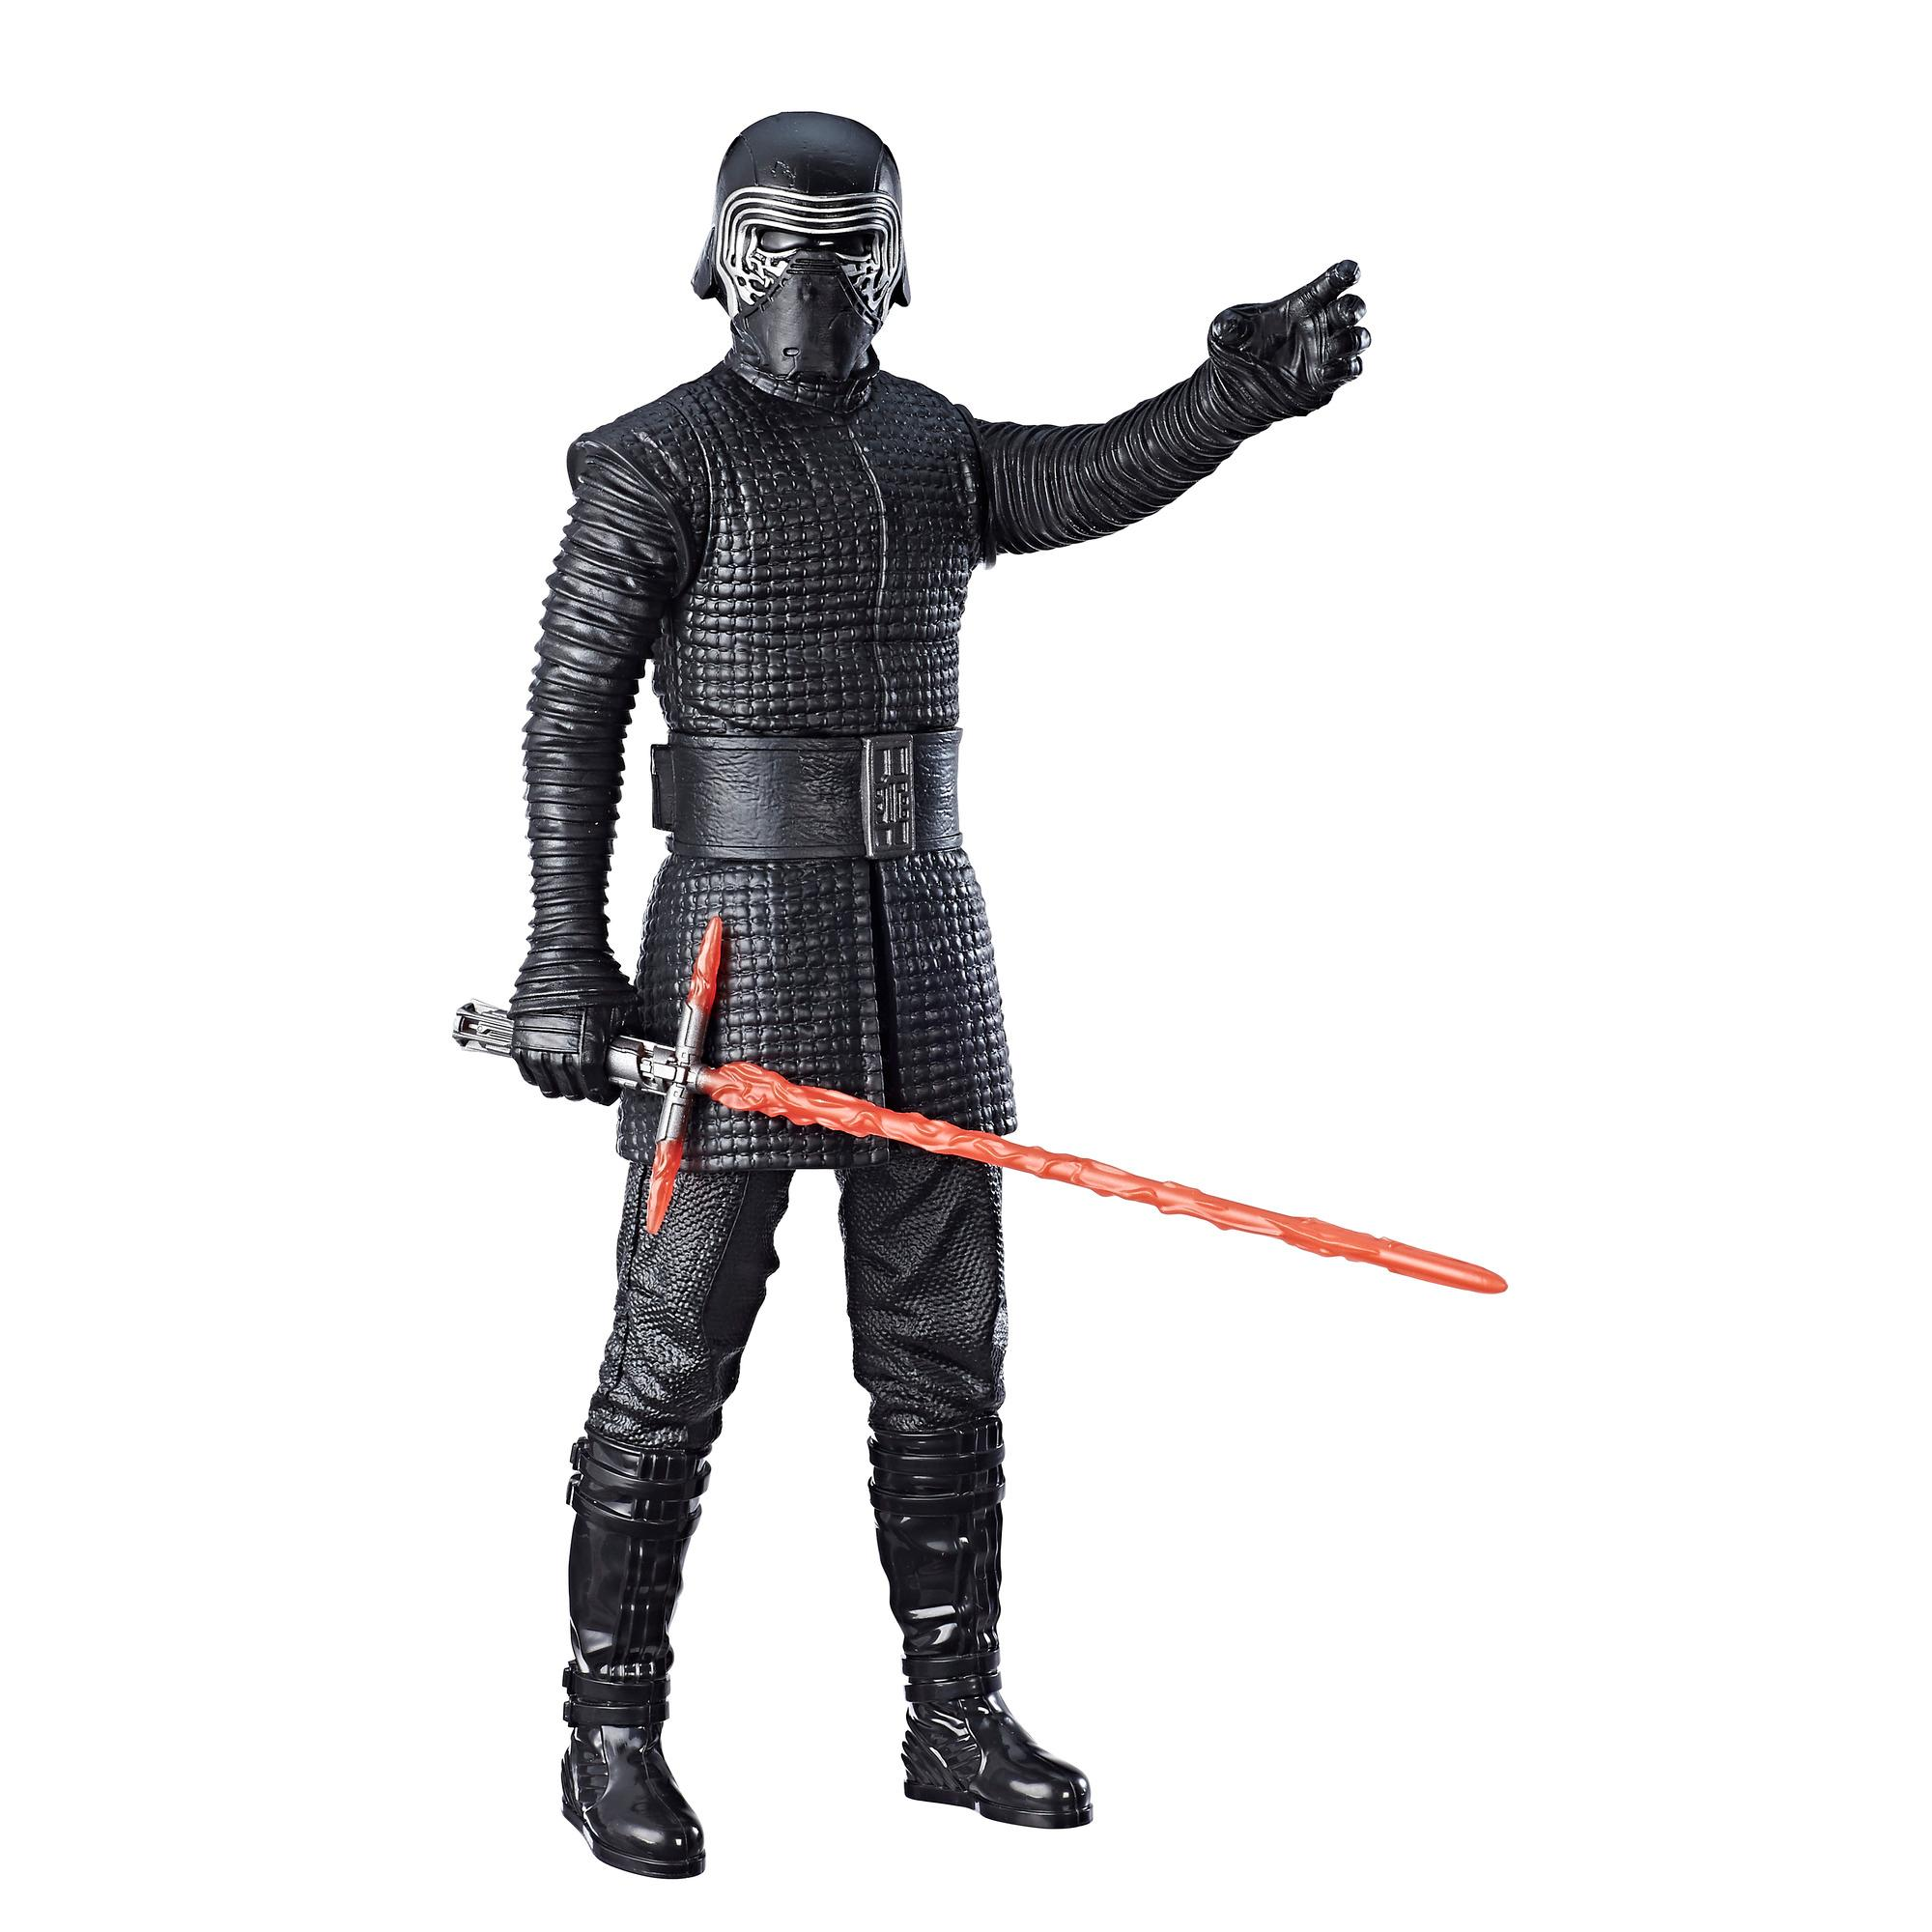 Star Wars: Os Últimos Jedi - Kylo Ren de 30,5 cm